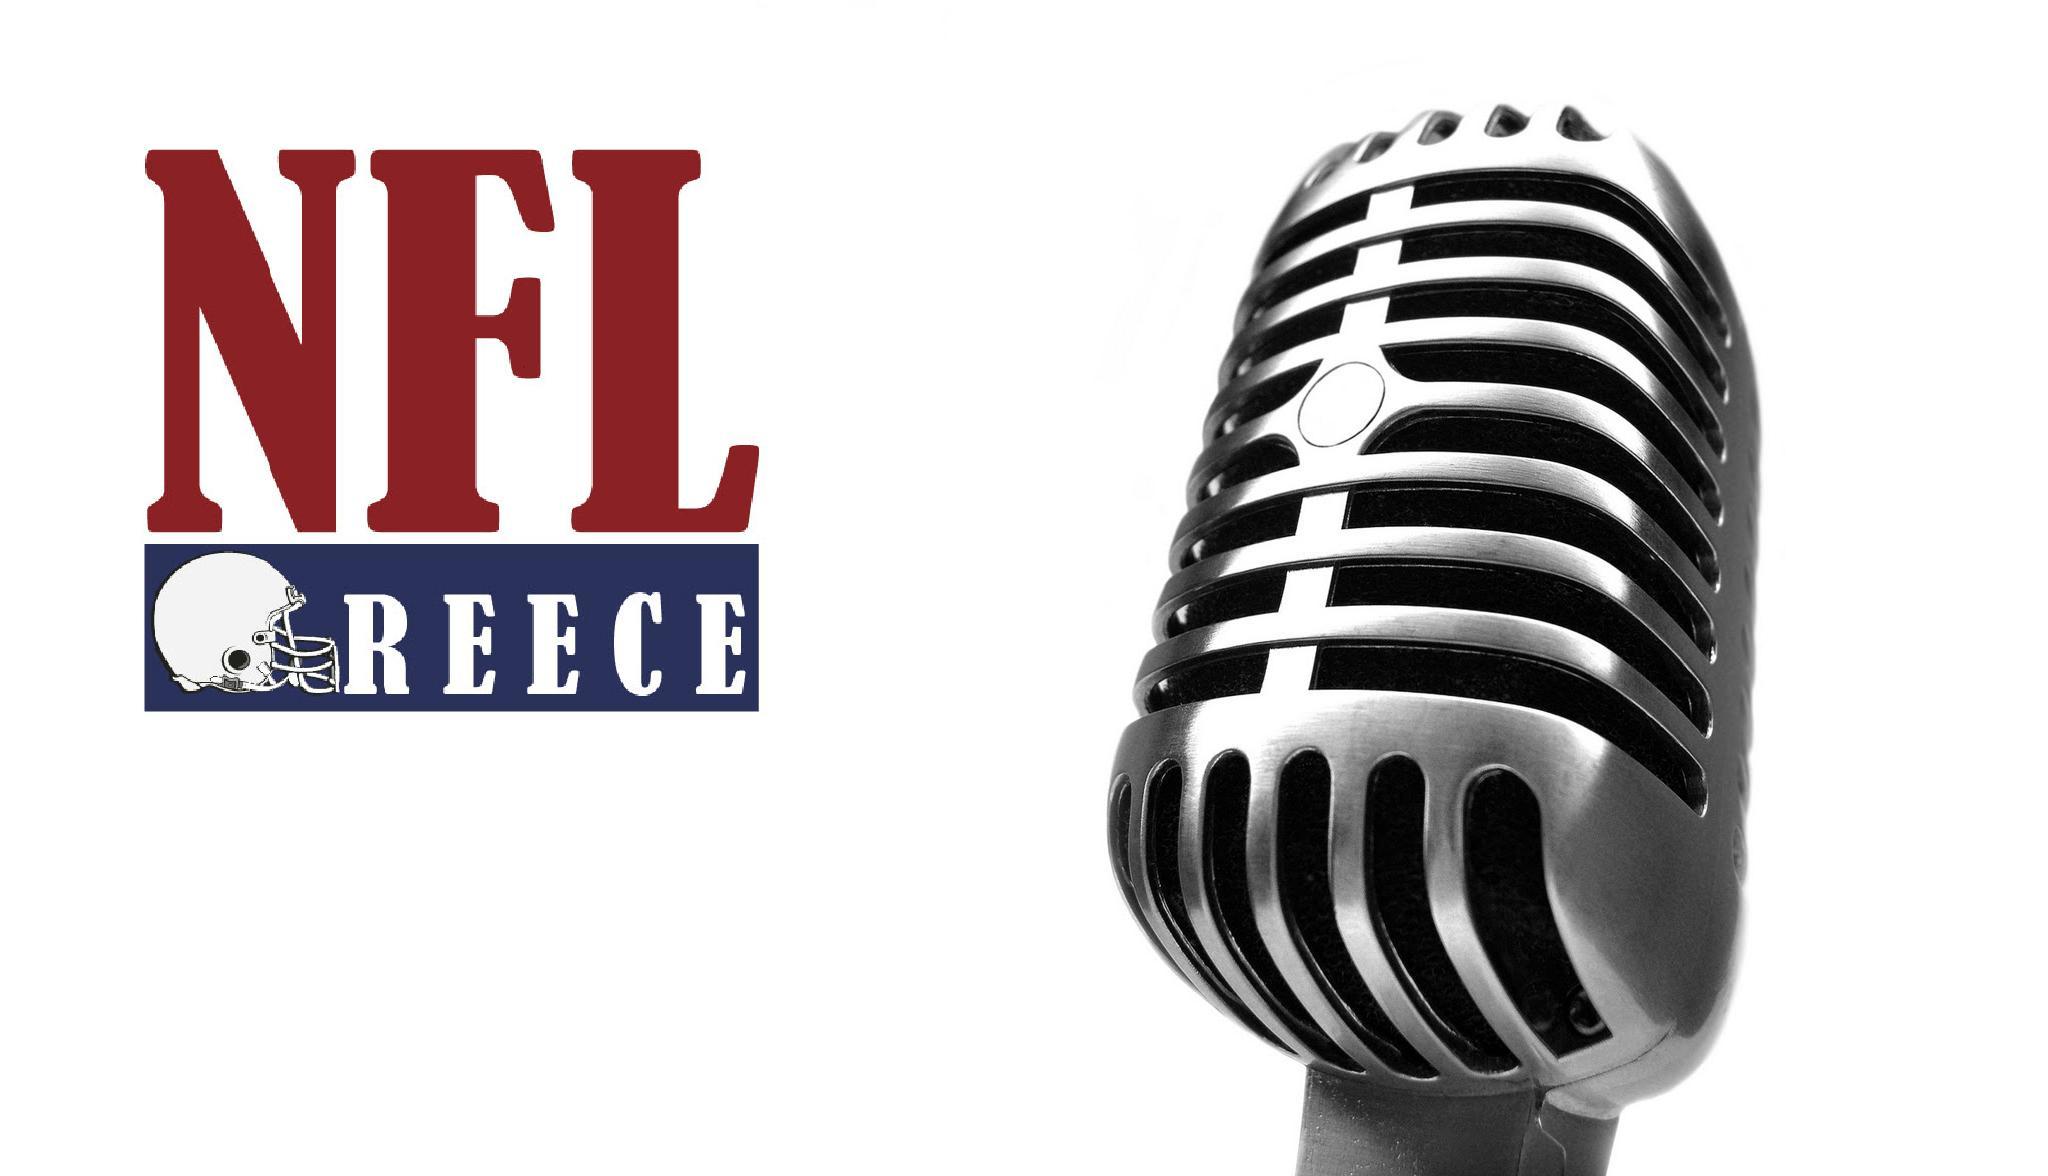 Nflgreece-radio1